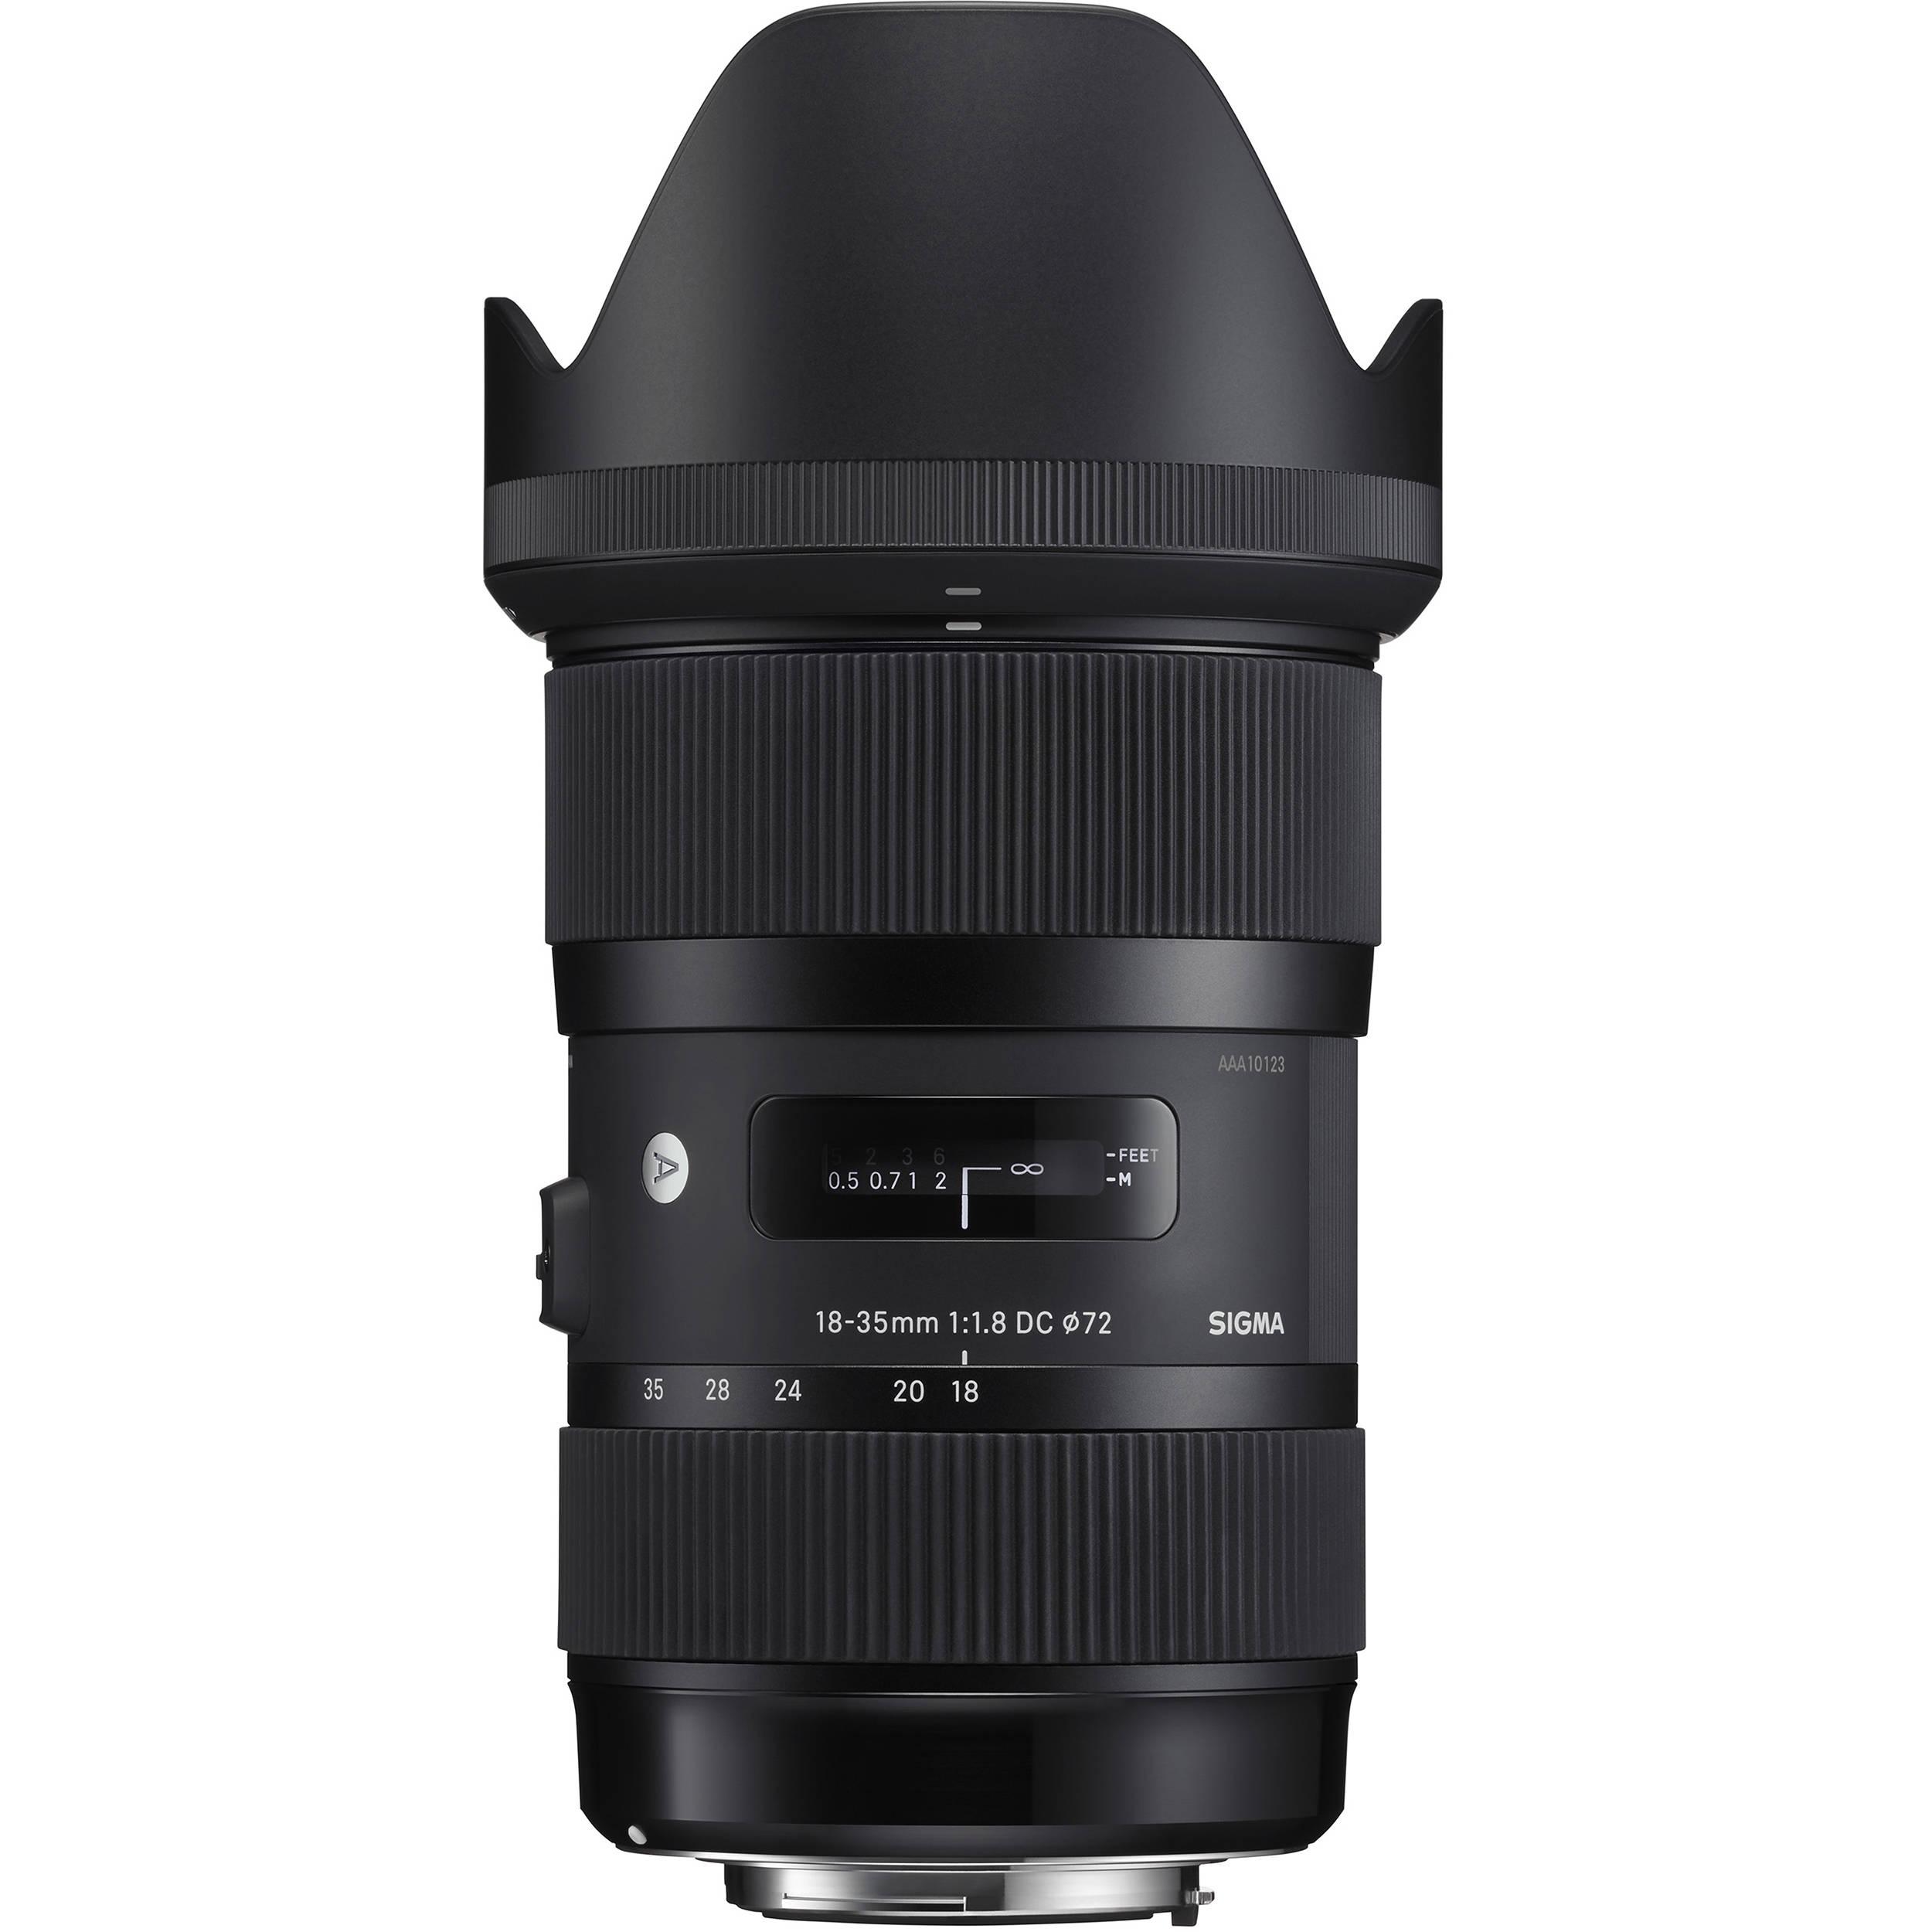 Sigma 18-35mm f/1.8 DC HSM Art Lens (Choose Type)  $599 @ B&H Photo w/ Free Shipping